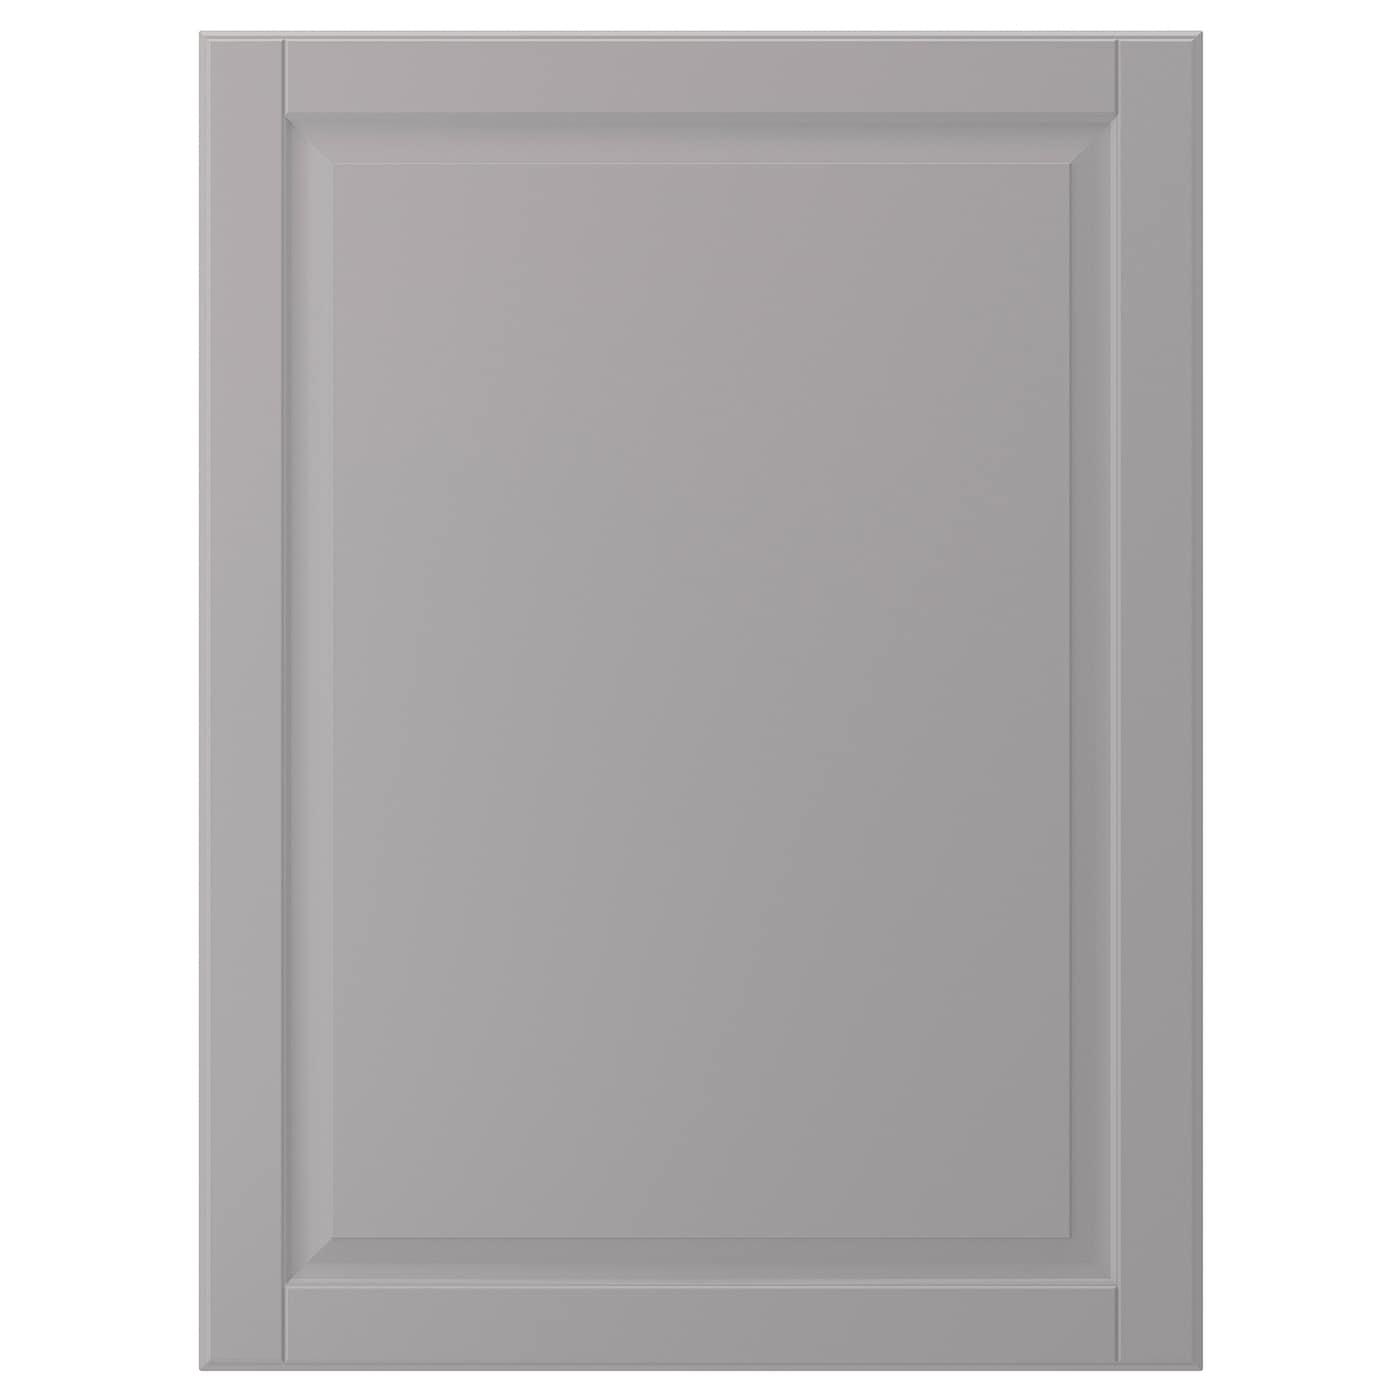 Ikea Kitchen Advertising: Kitchen Products, Doors And Worktops